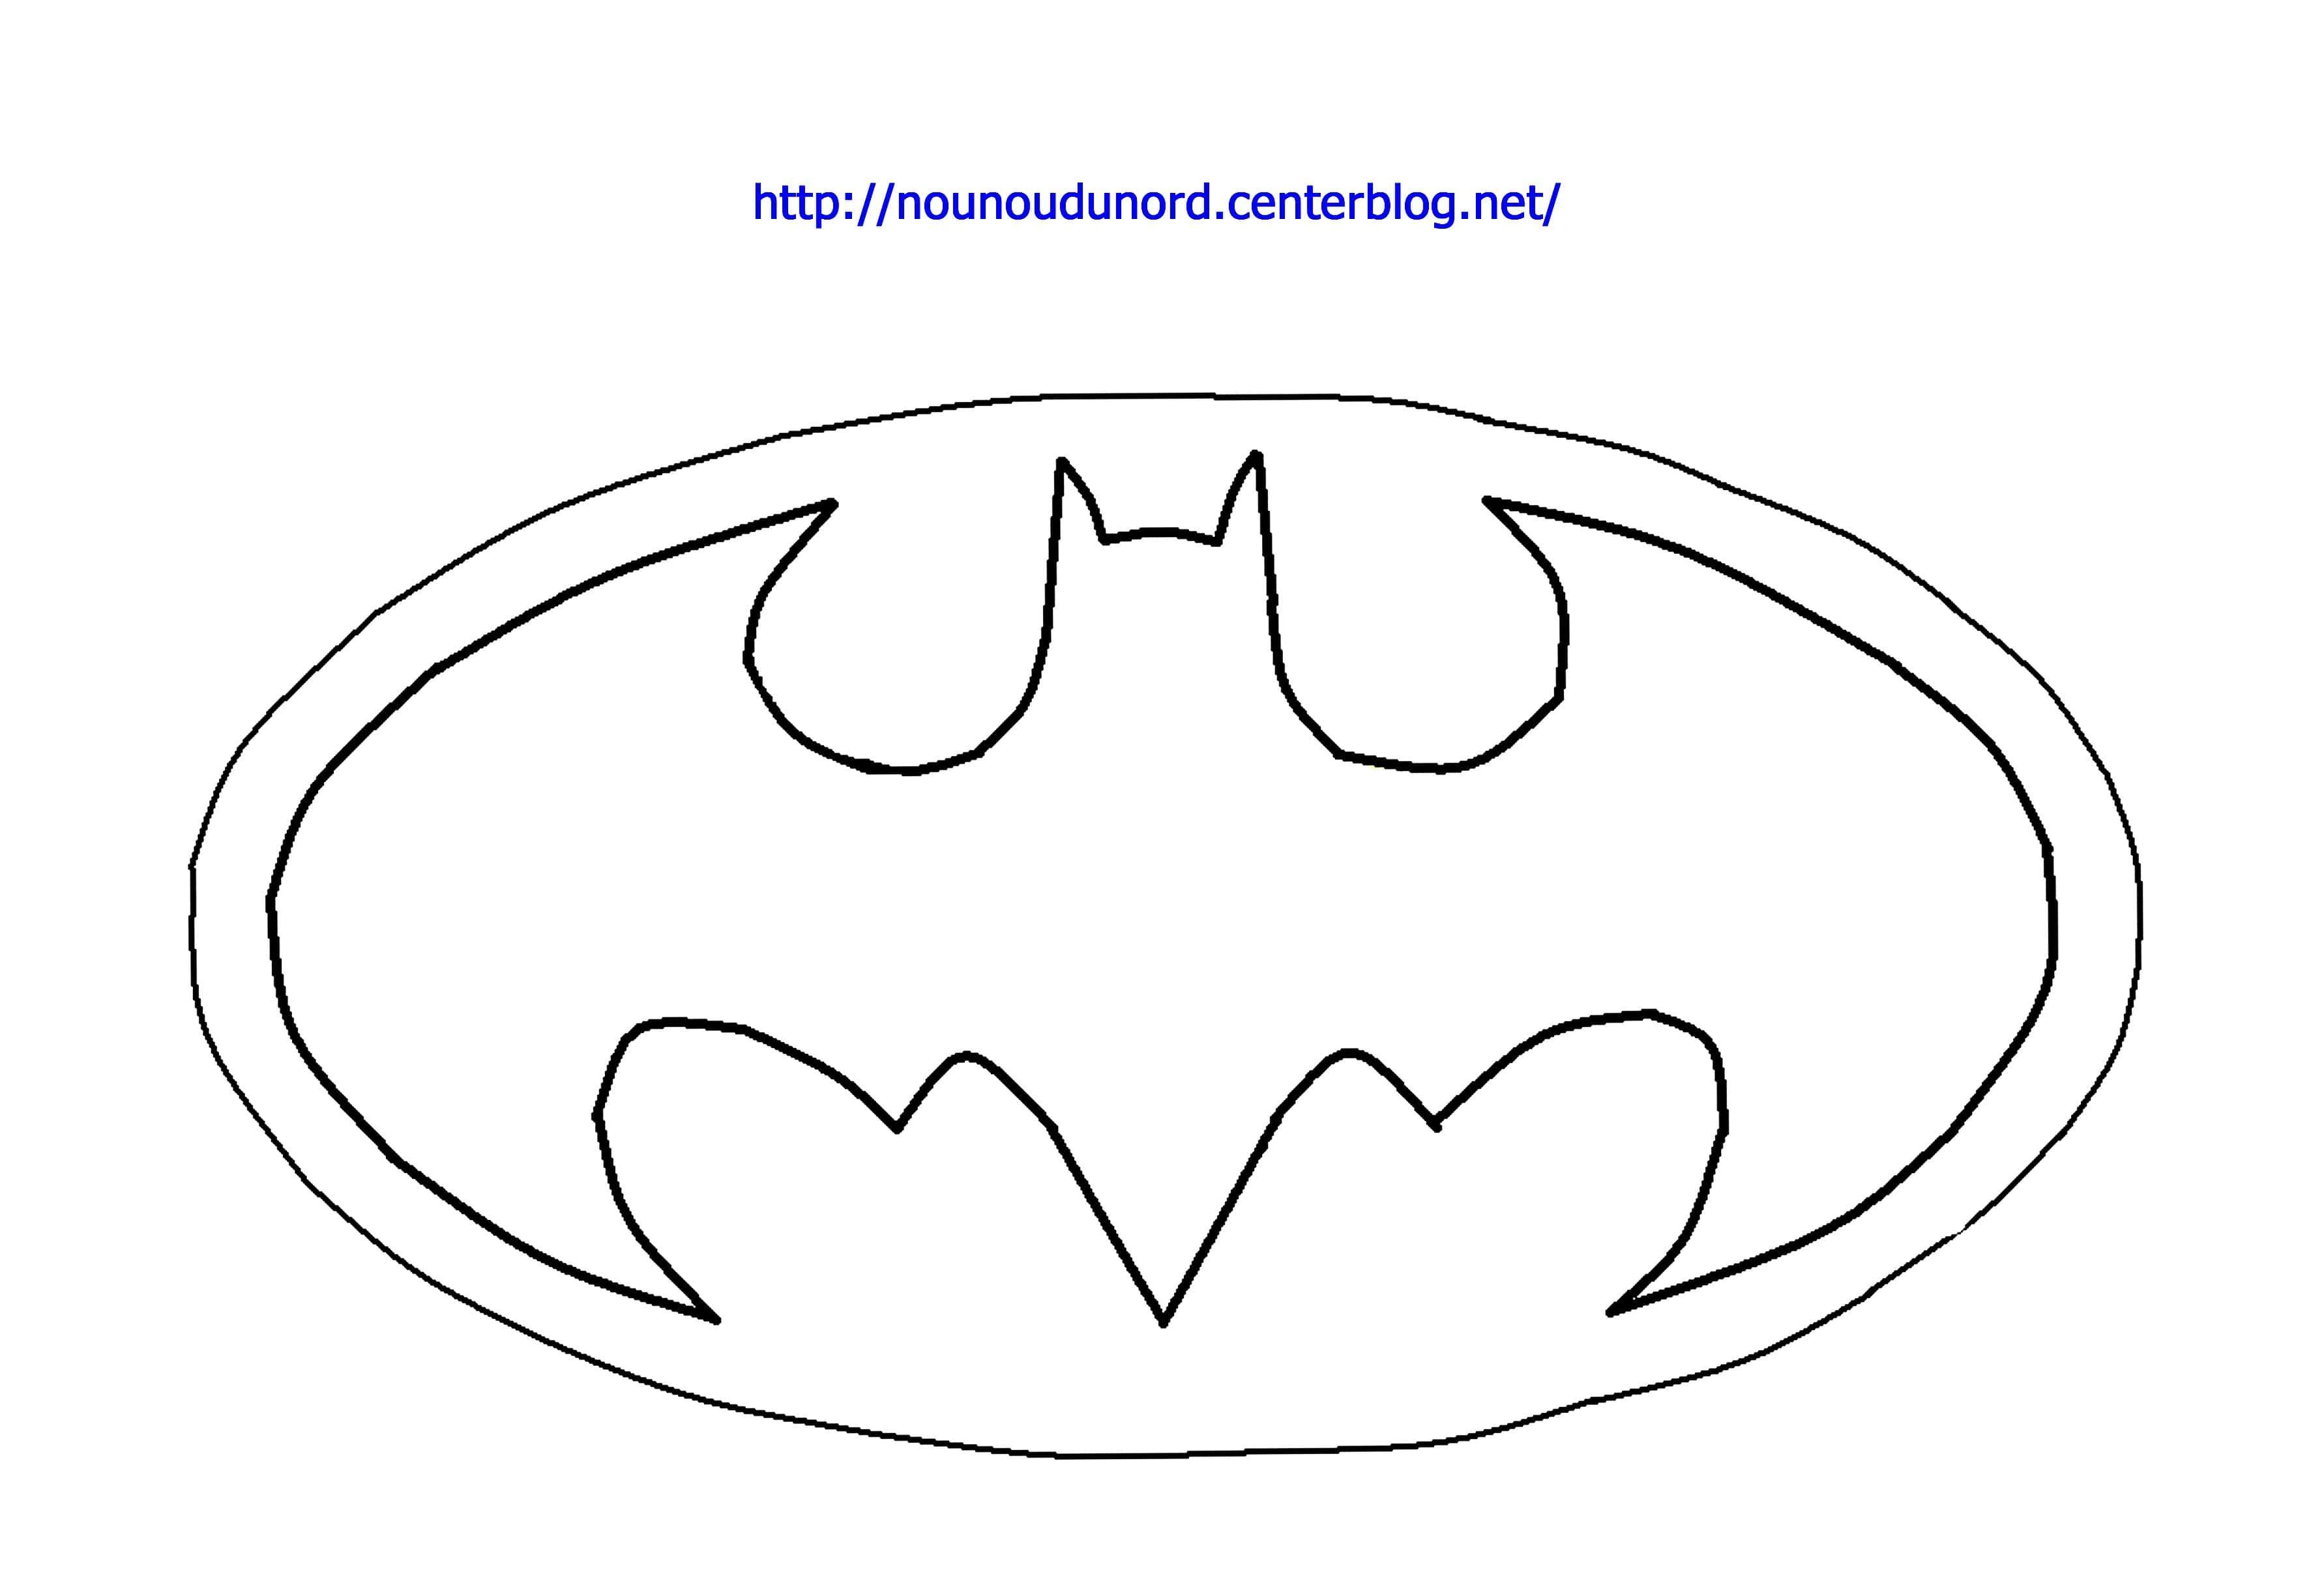 Dessin gratuit batman à imprimer  Logo batman, Coloriage batman